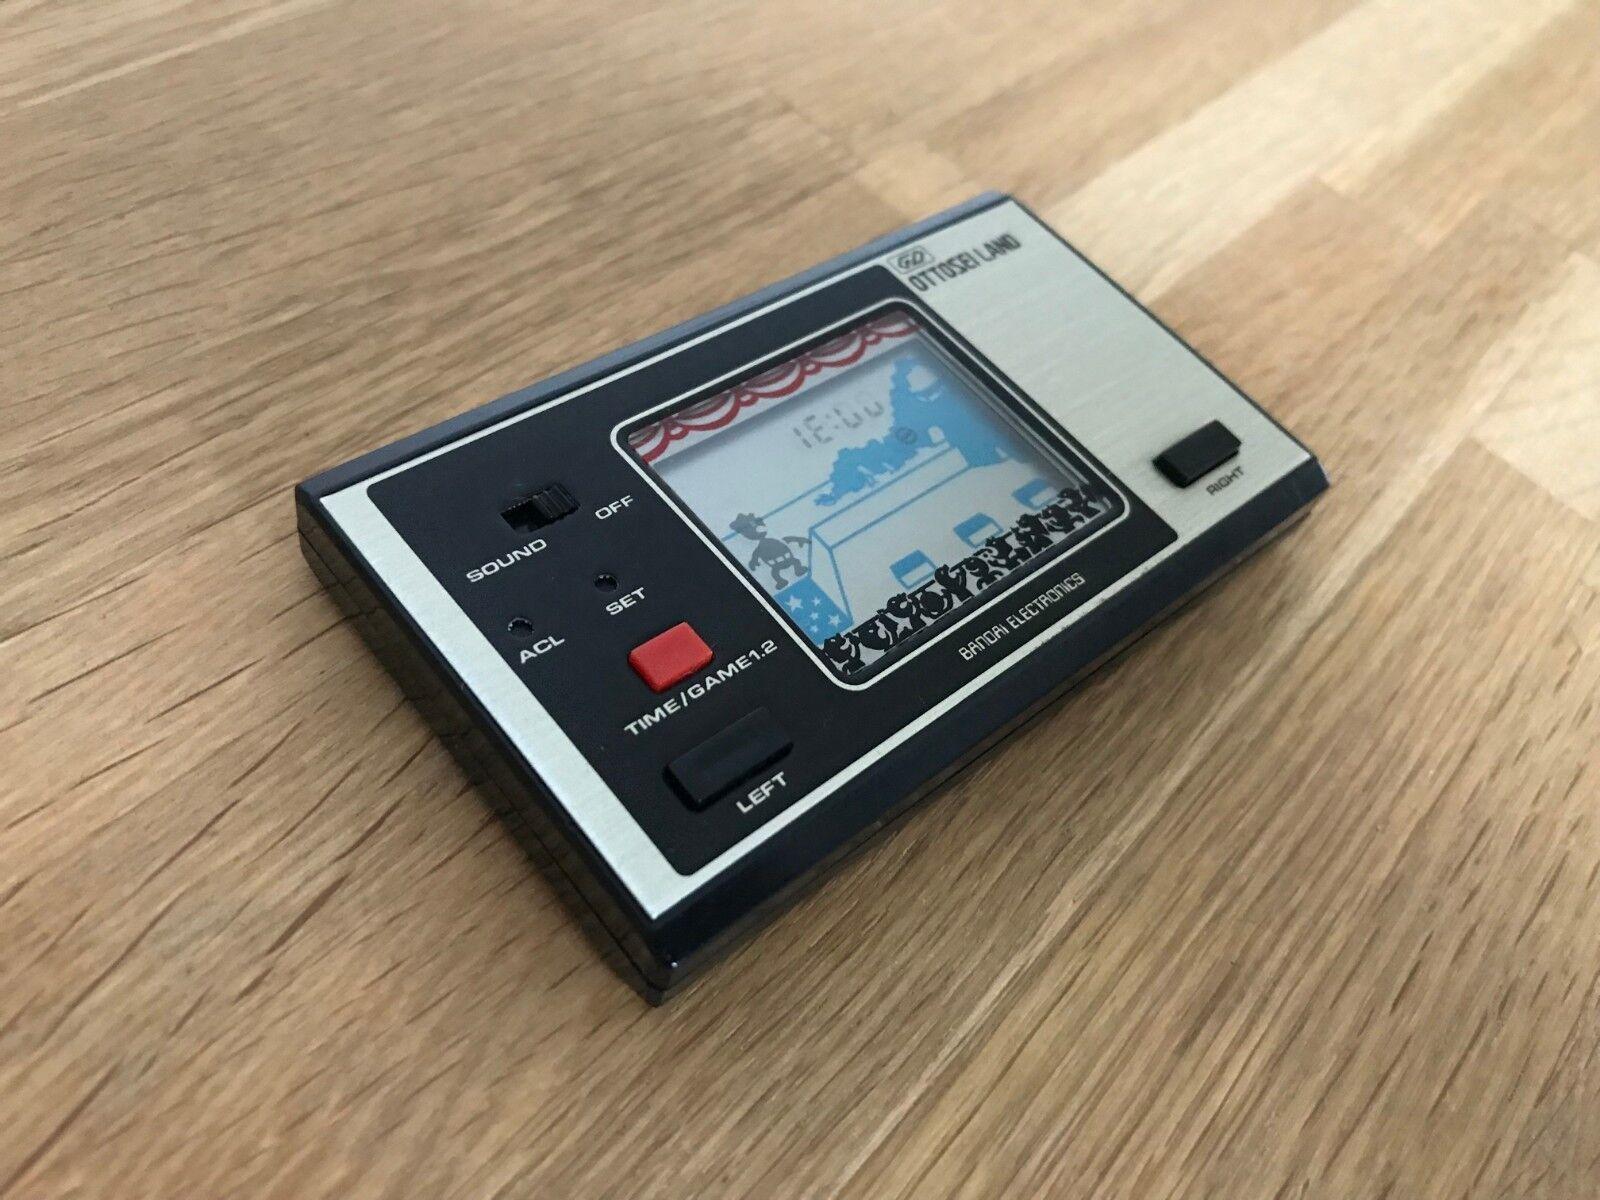 Rare Bandai Ottosei Land 1981 Vintage LCD Handheld Electronic Game - Req Repairs